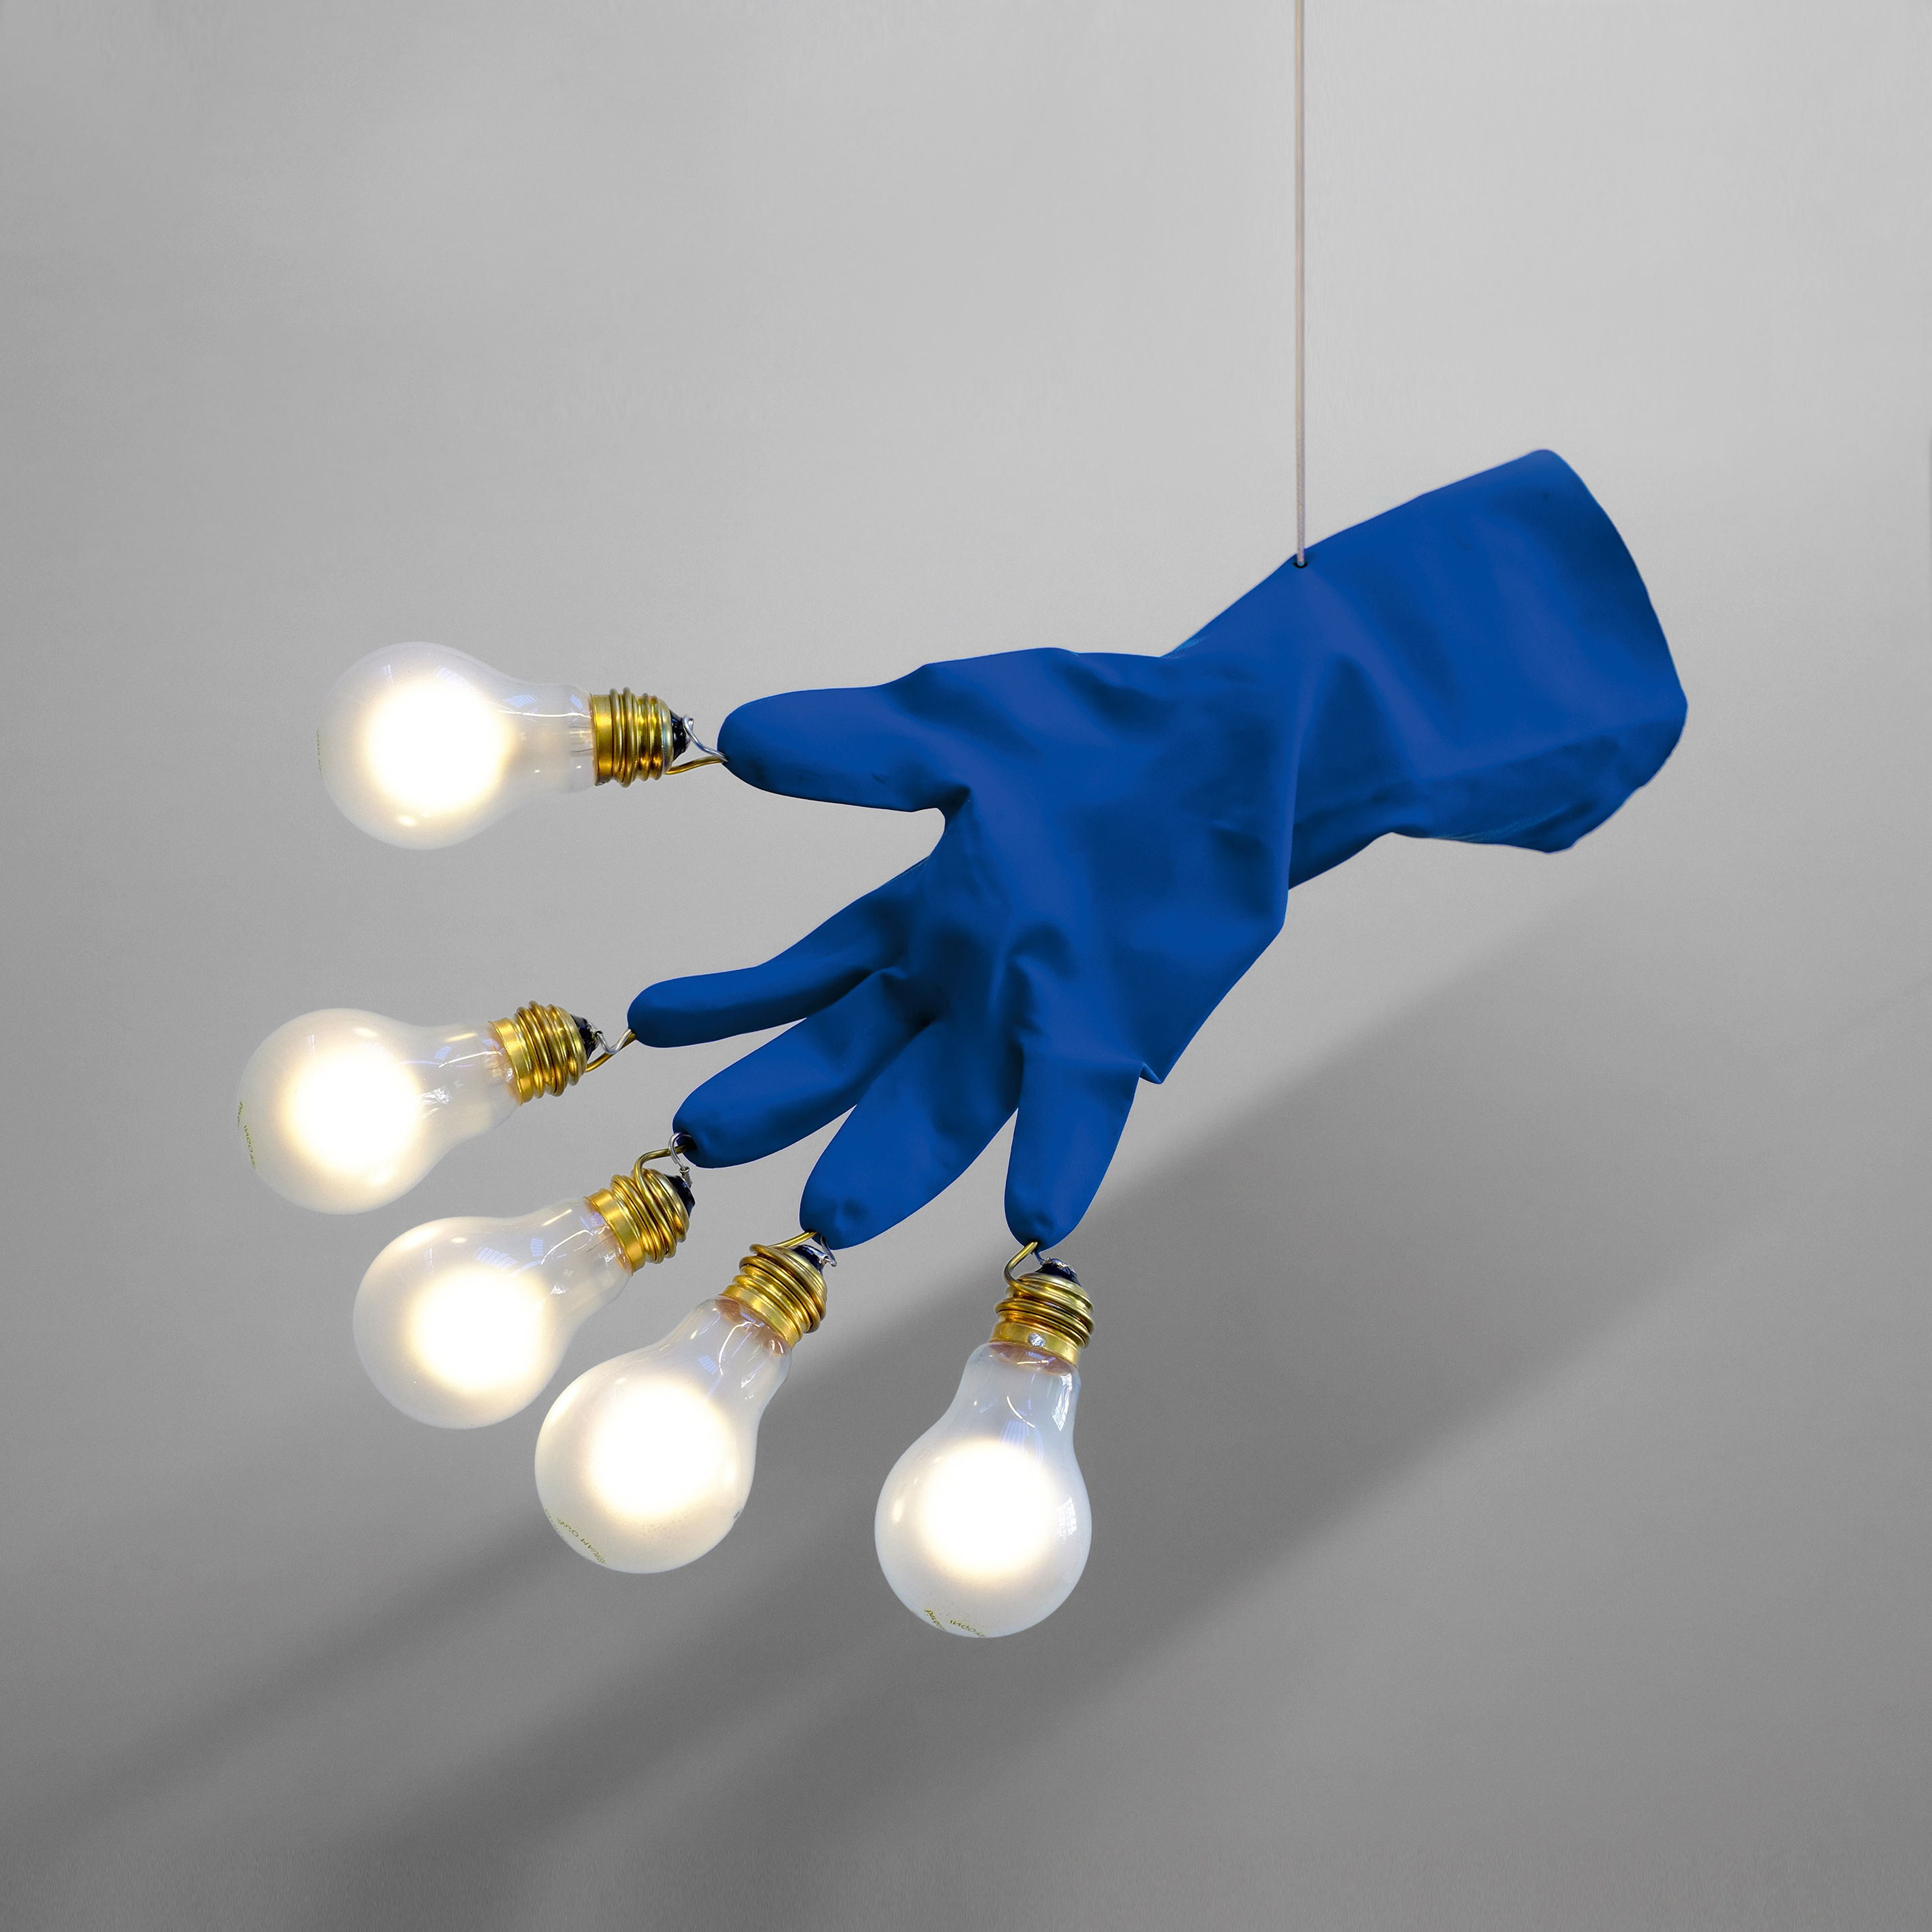 Lighting - Pendant Lighting - Luzy Take Five Pendant - / LED - 5 bulbs by Ingo Maurer - Blue - Brass, Glass, Plastique haute résistance, Steel